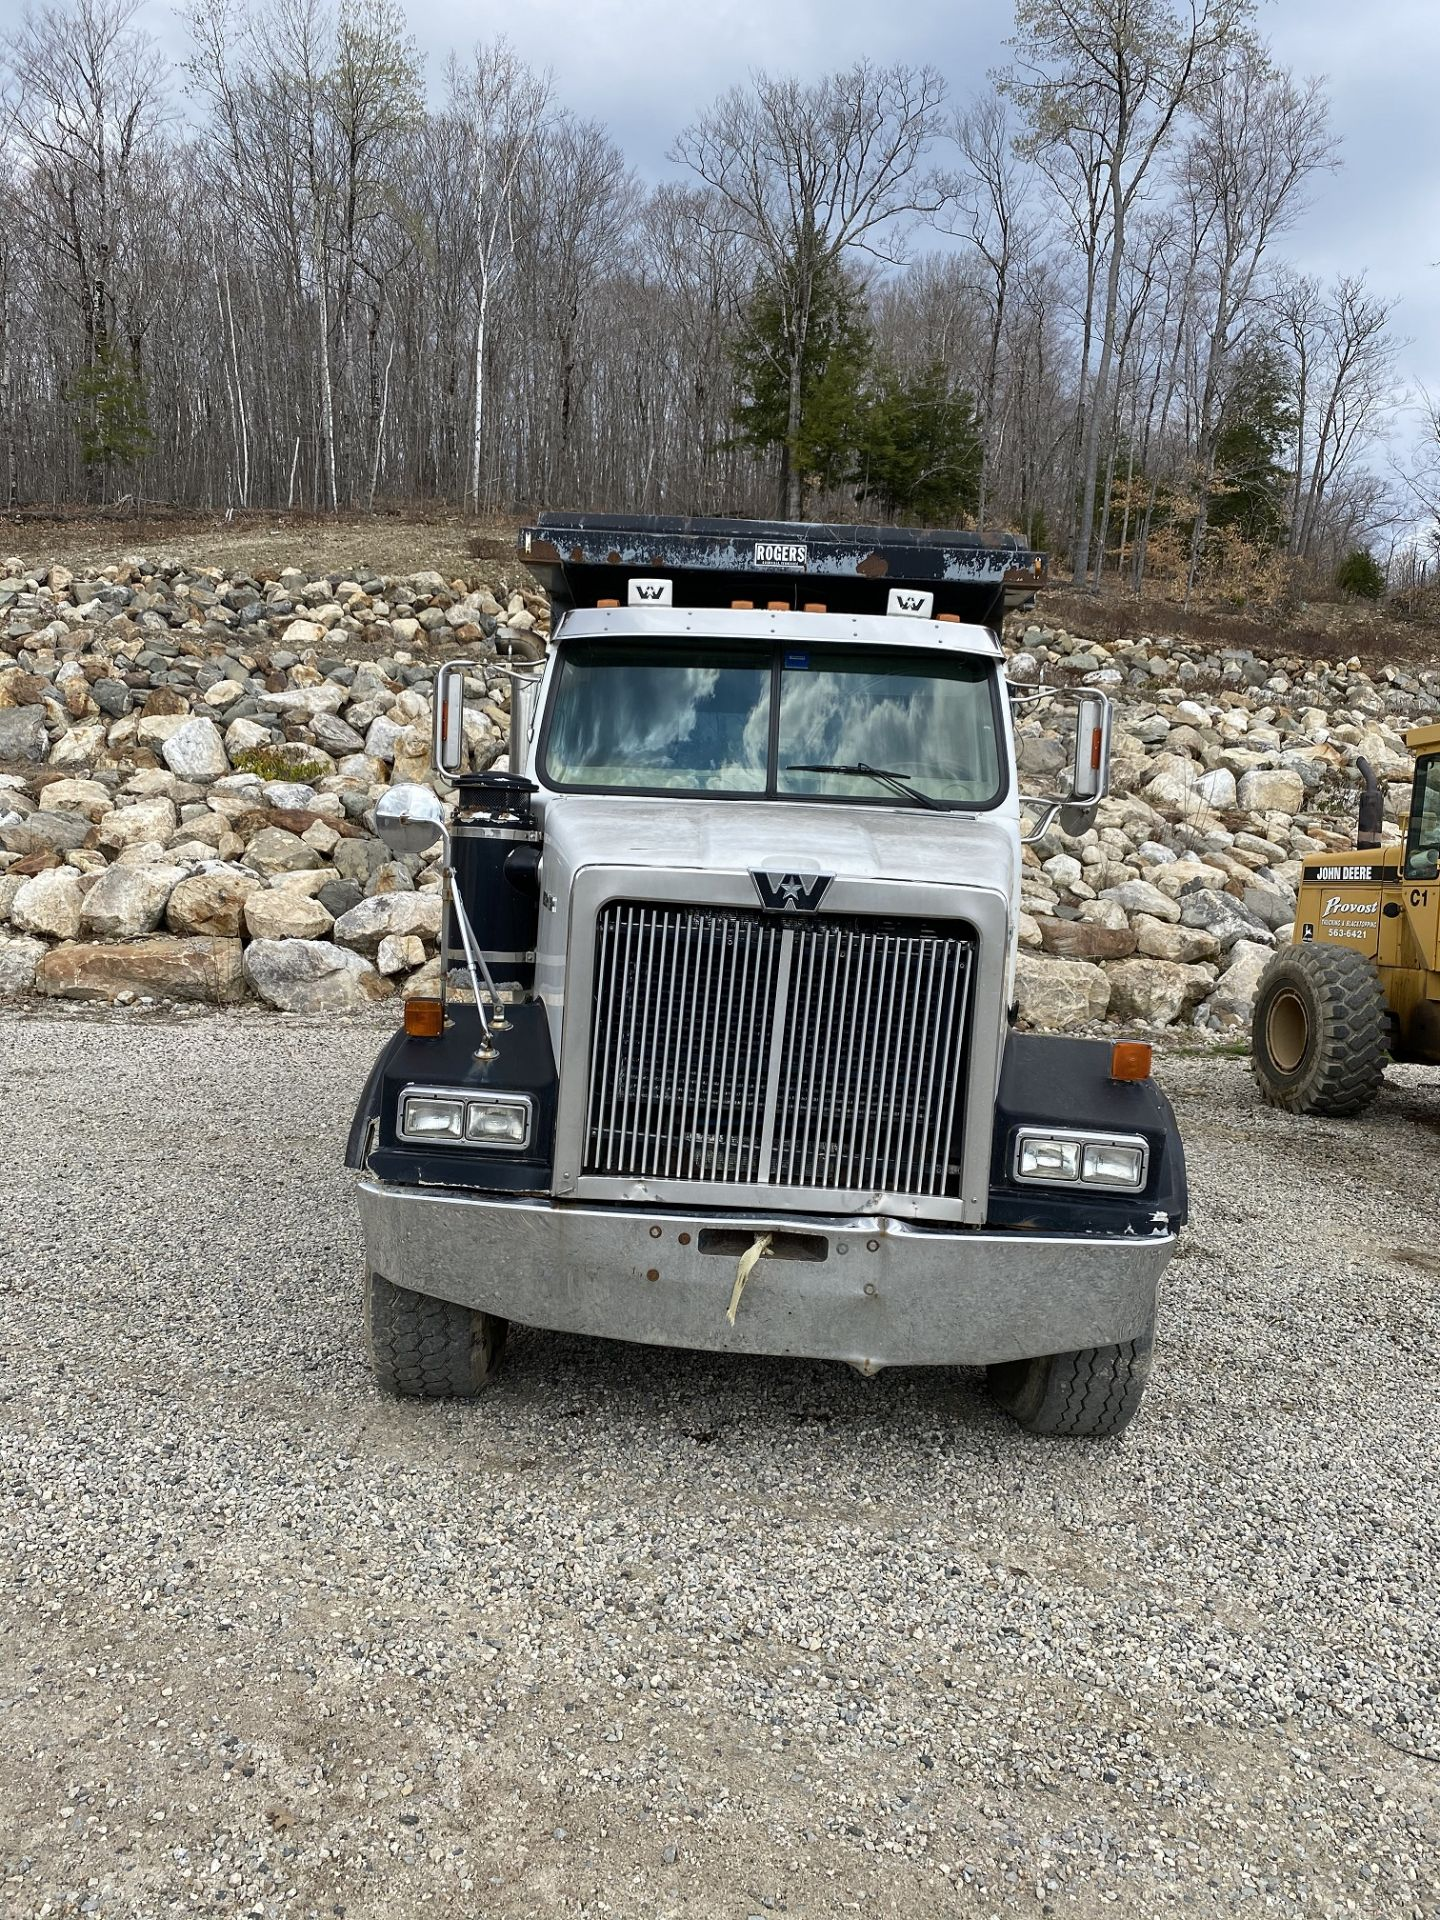 2000 Western Star 12 Wheel Dump w/ Drop Axle, Cat Diesel C10 6 CYL. 78,000 GVWR, ODOM 323,142, - Image 2 of 8